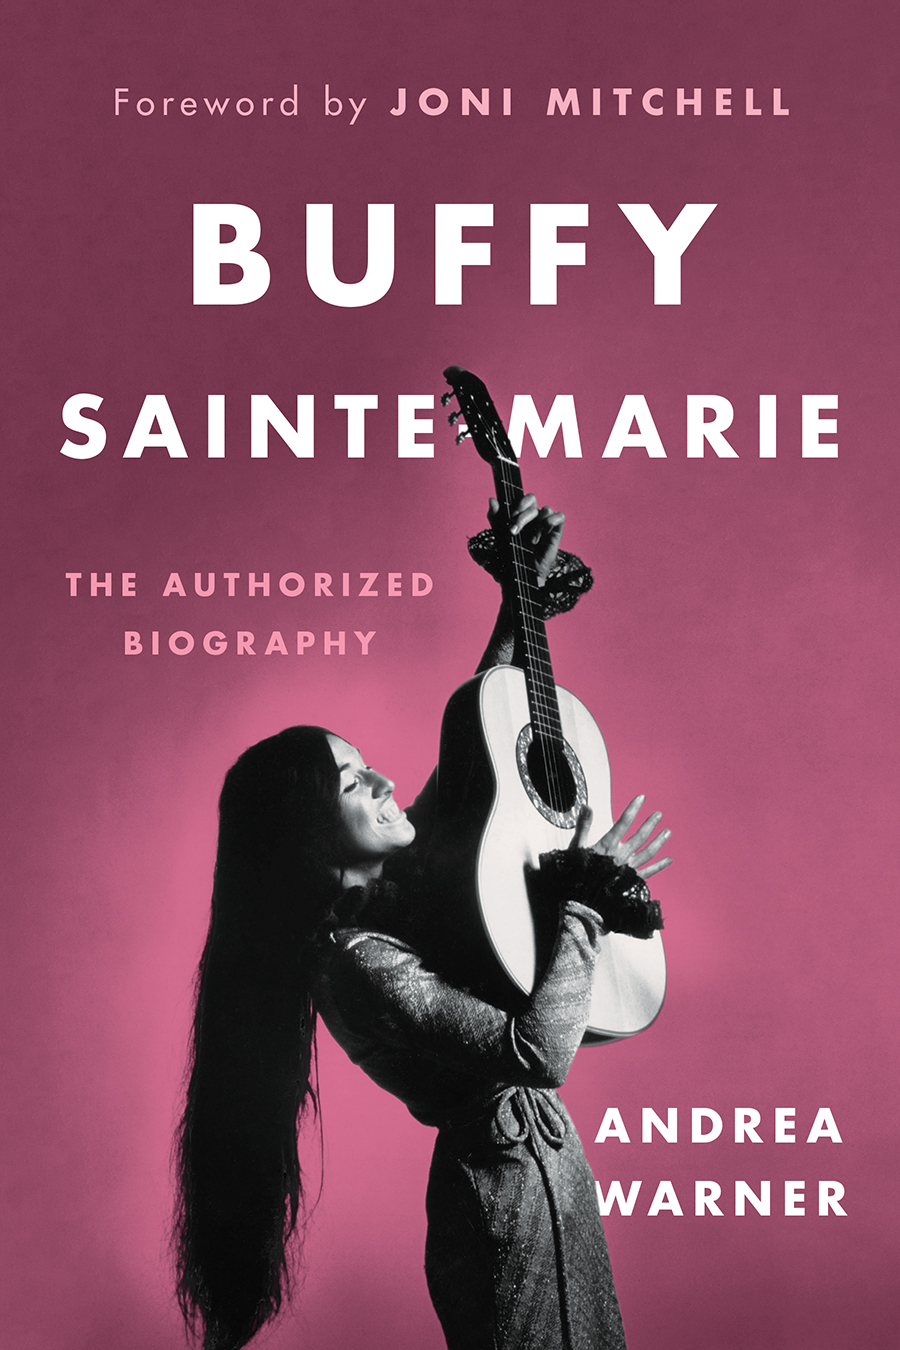 Buffy_cover_RGB150dpi.jpg